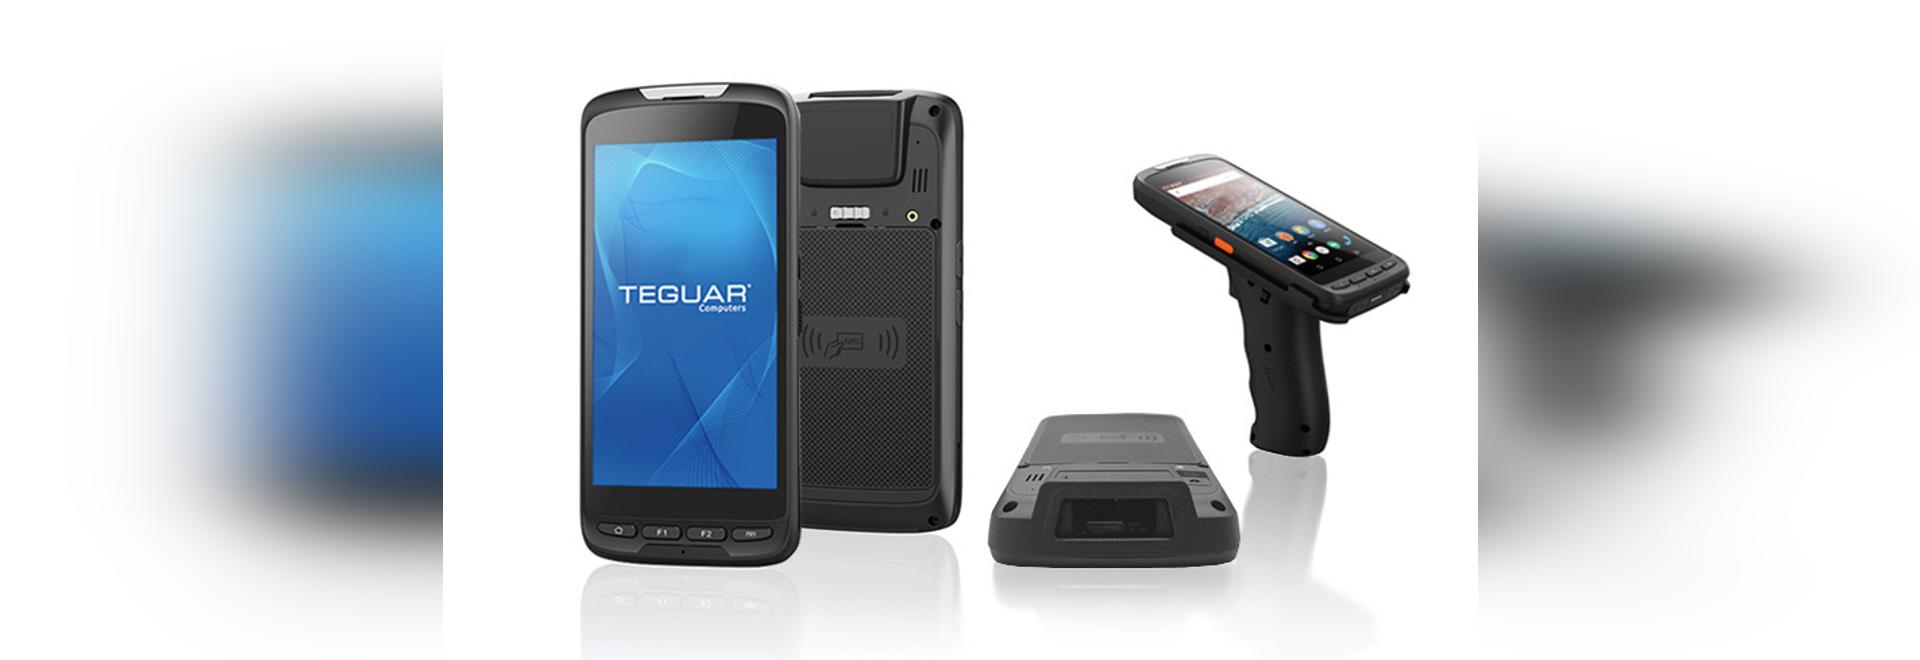 "Teguar 5"" dispositivo portatile robusto | TRH-A5380-05"